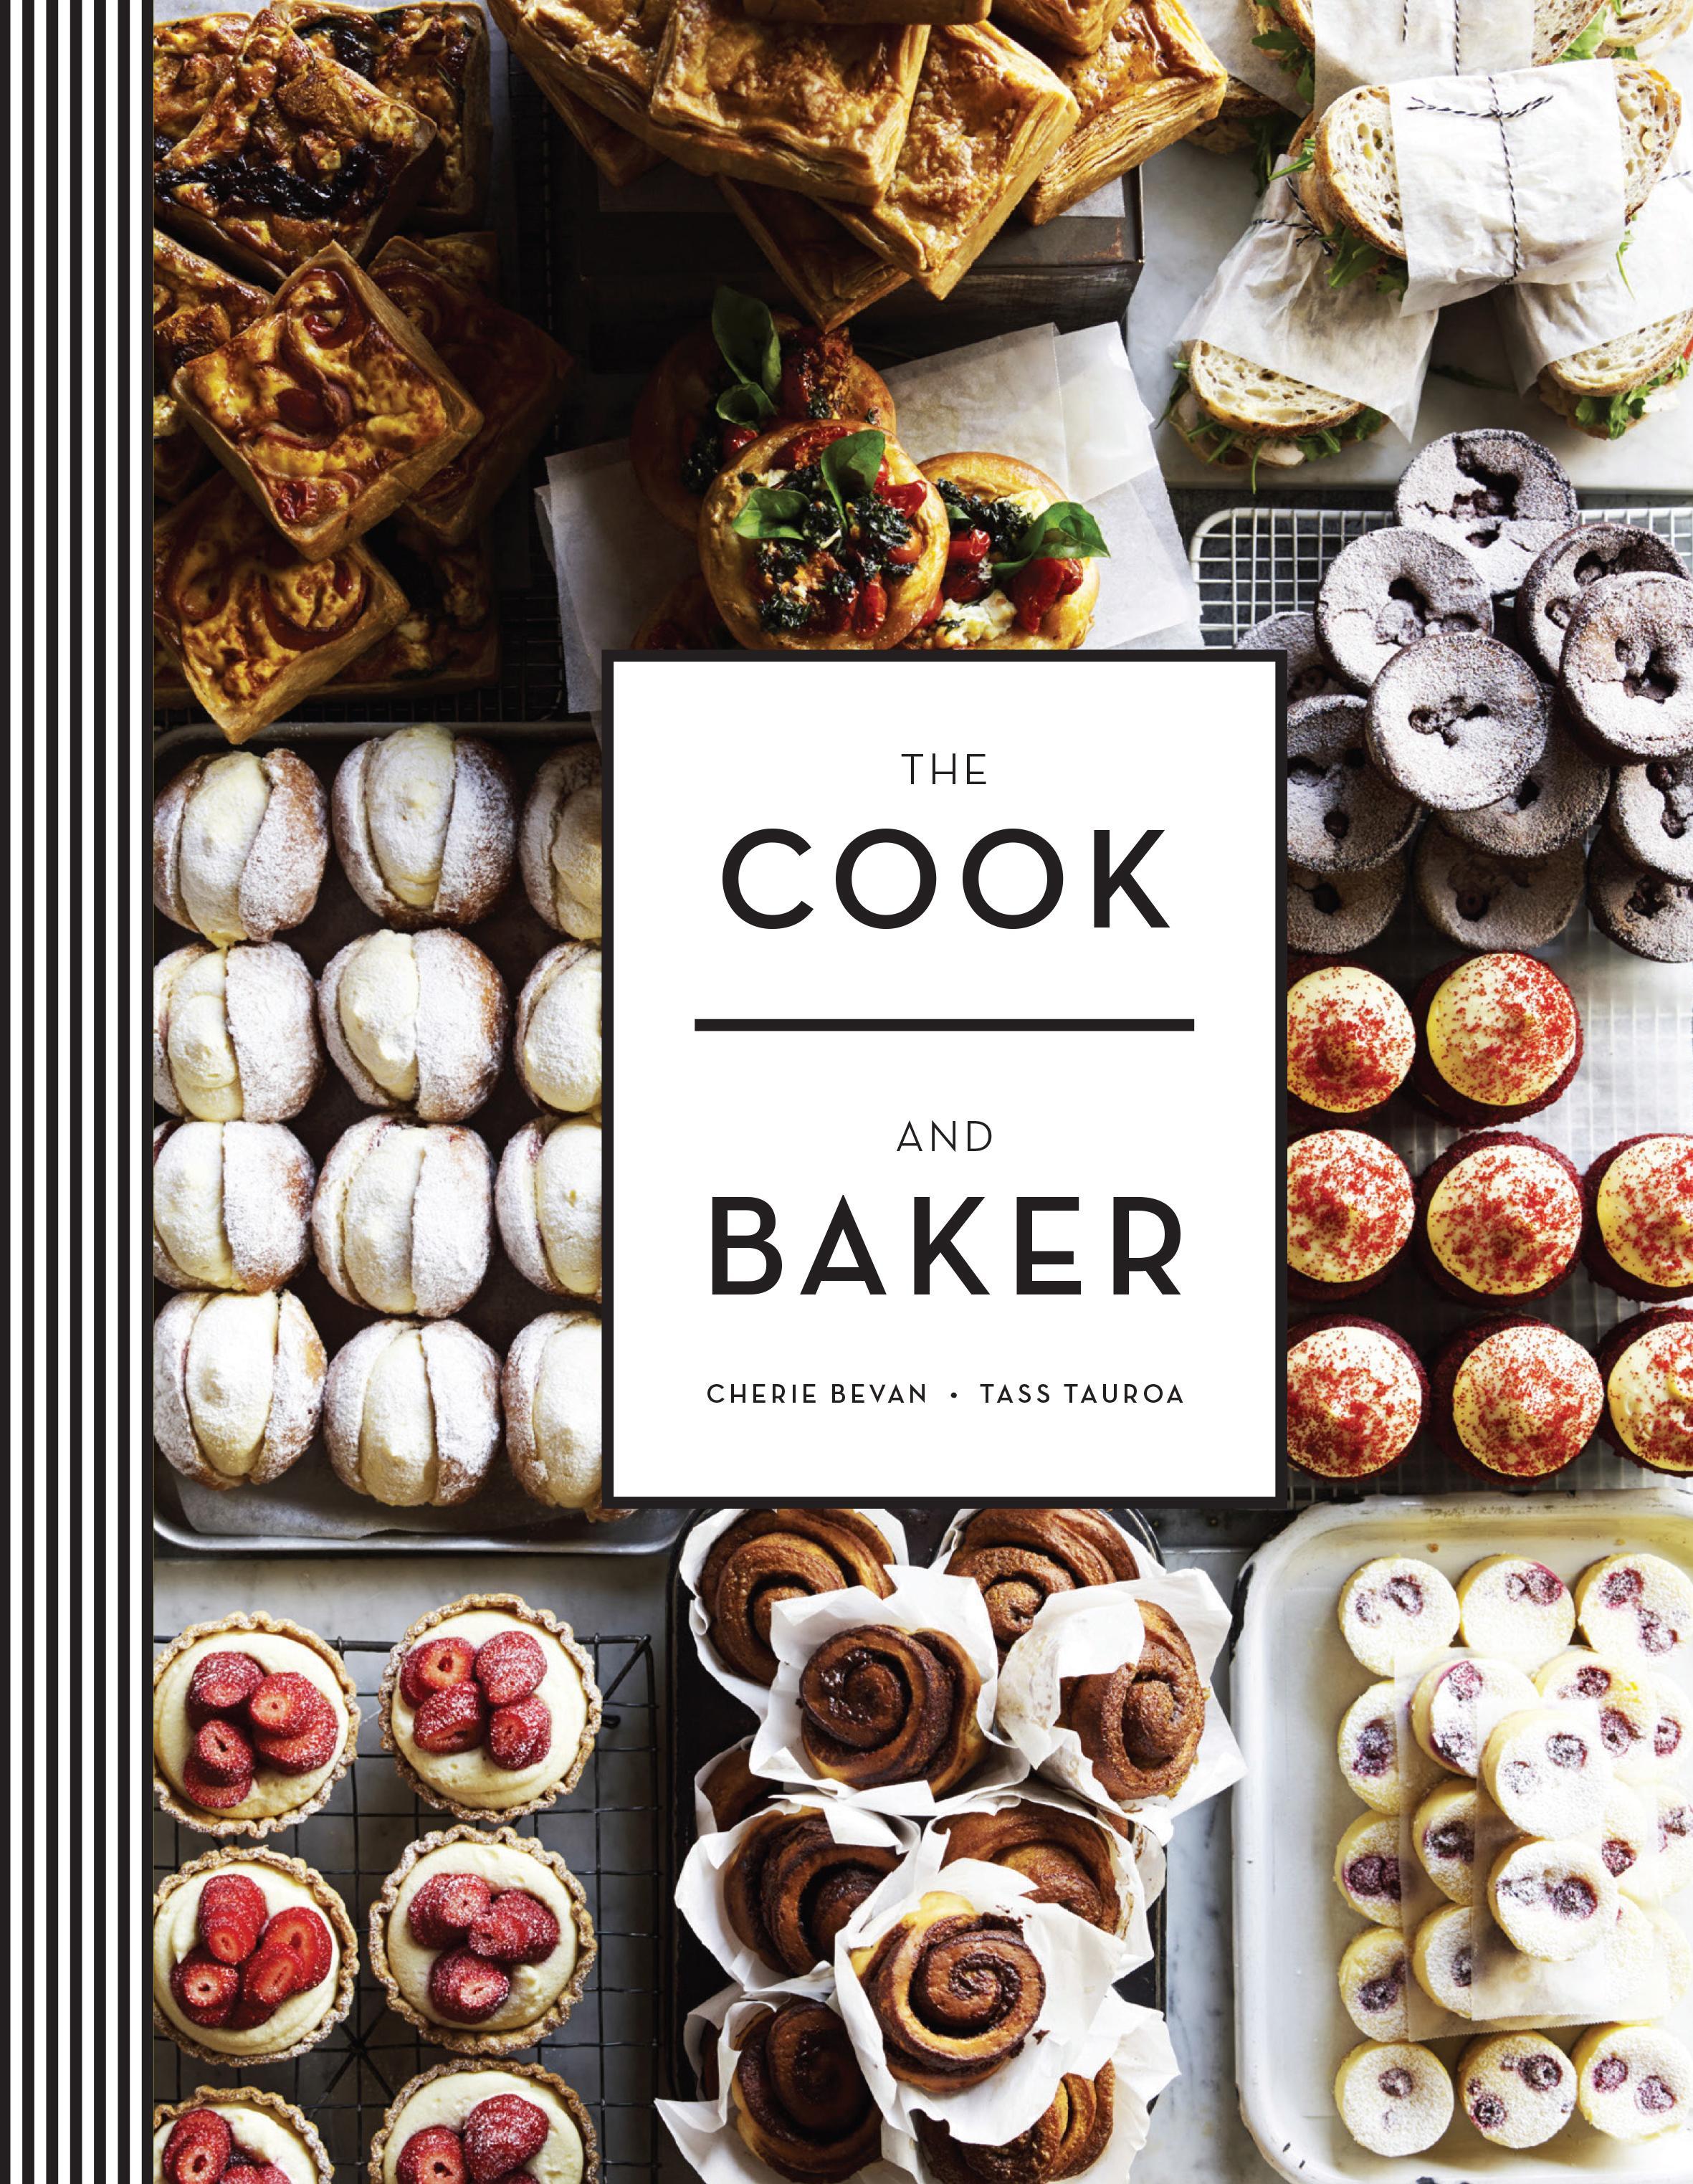 The CookandBaker